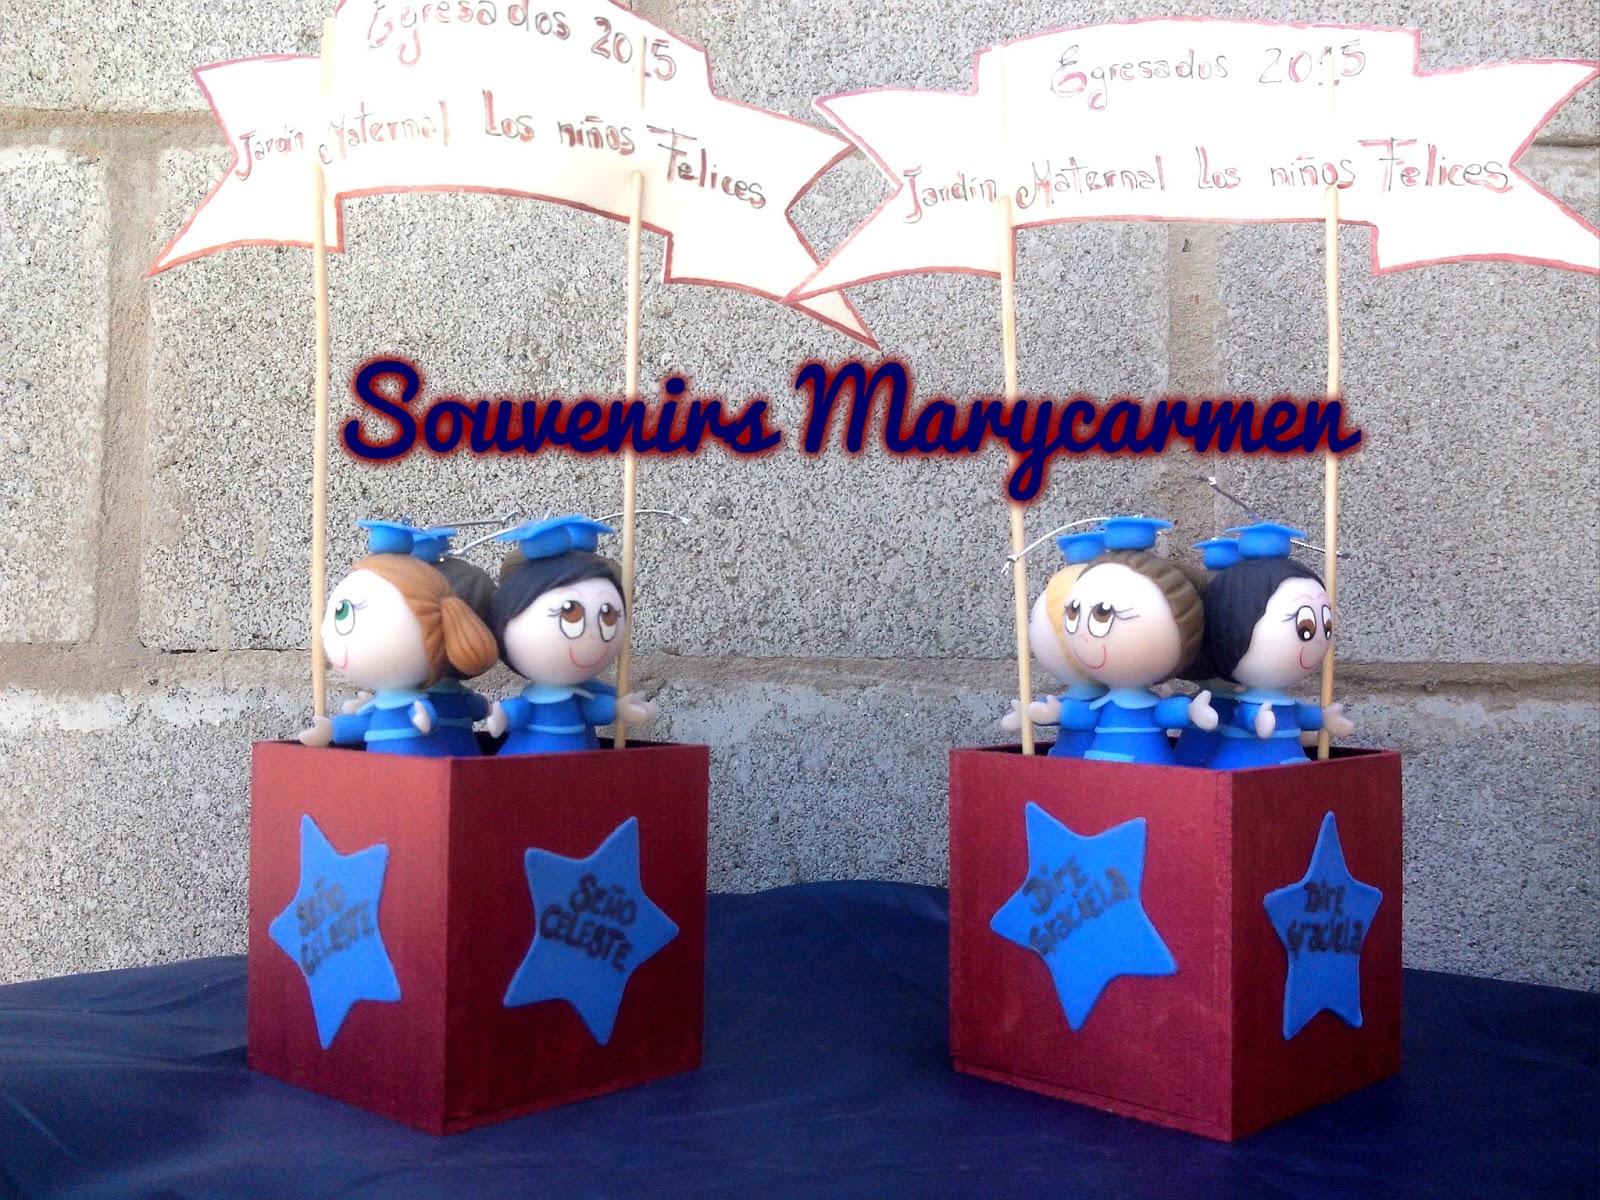 Souvenirs egresados jardin maternal los ni os felices 2015 for Jardin maternal unlp 2015